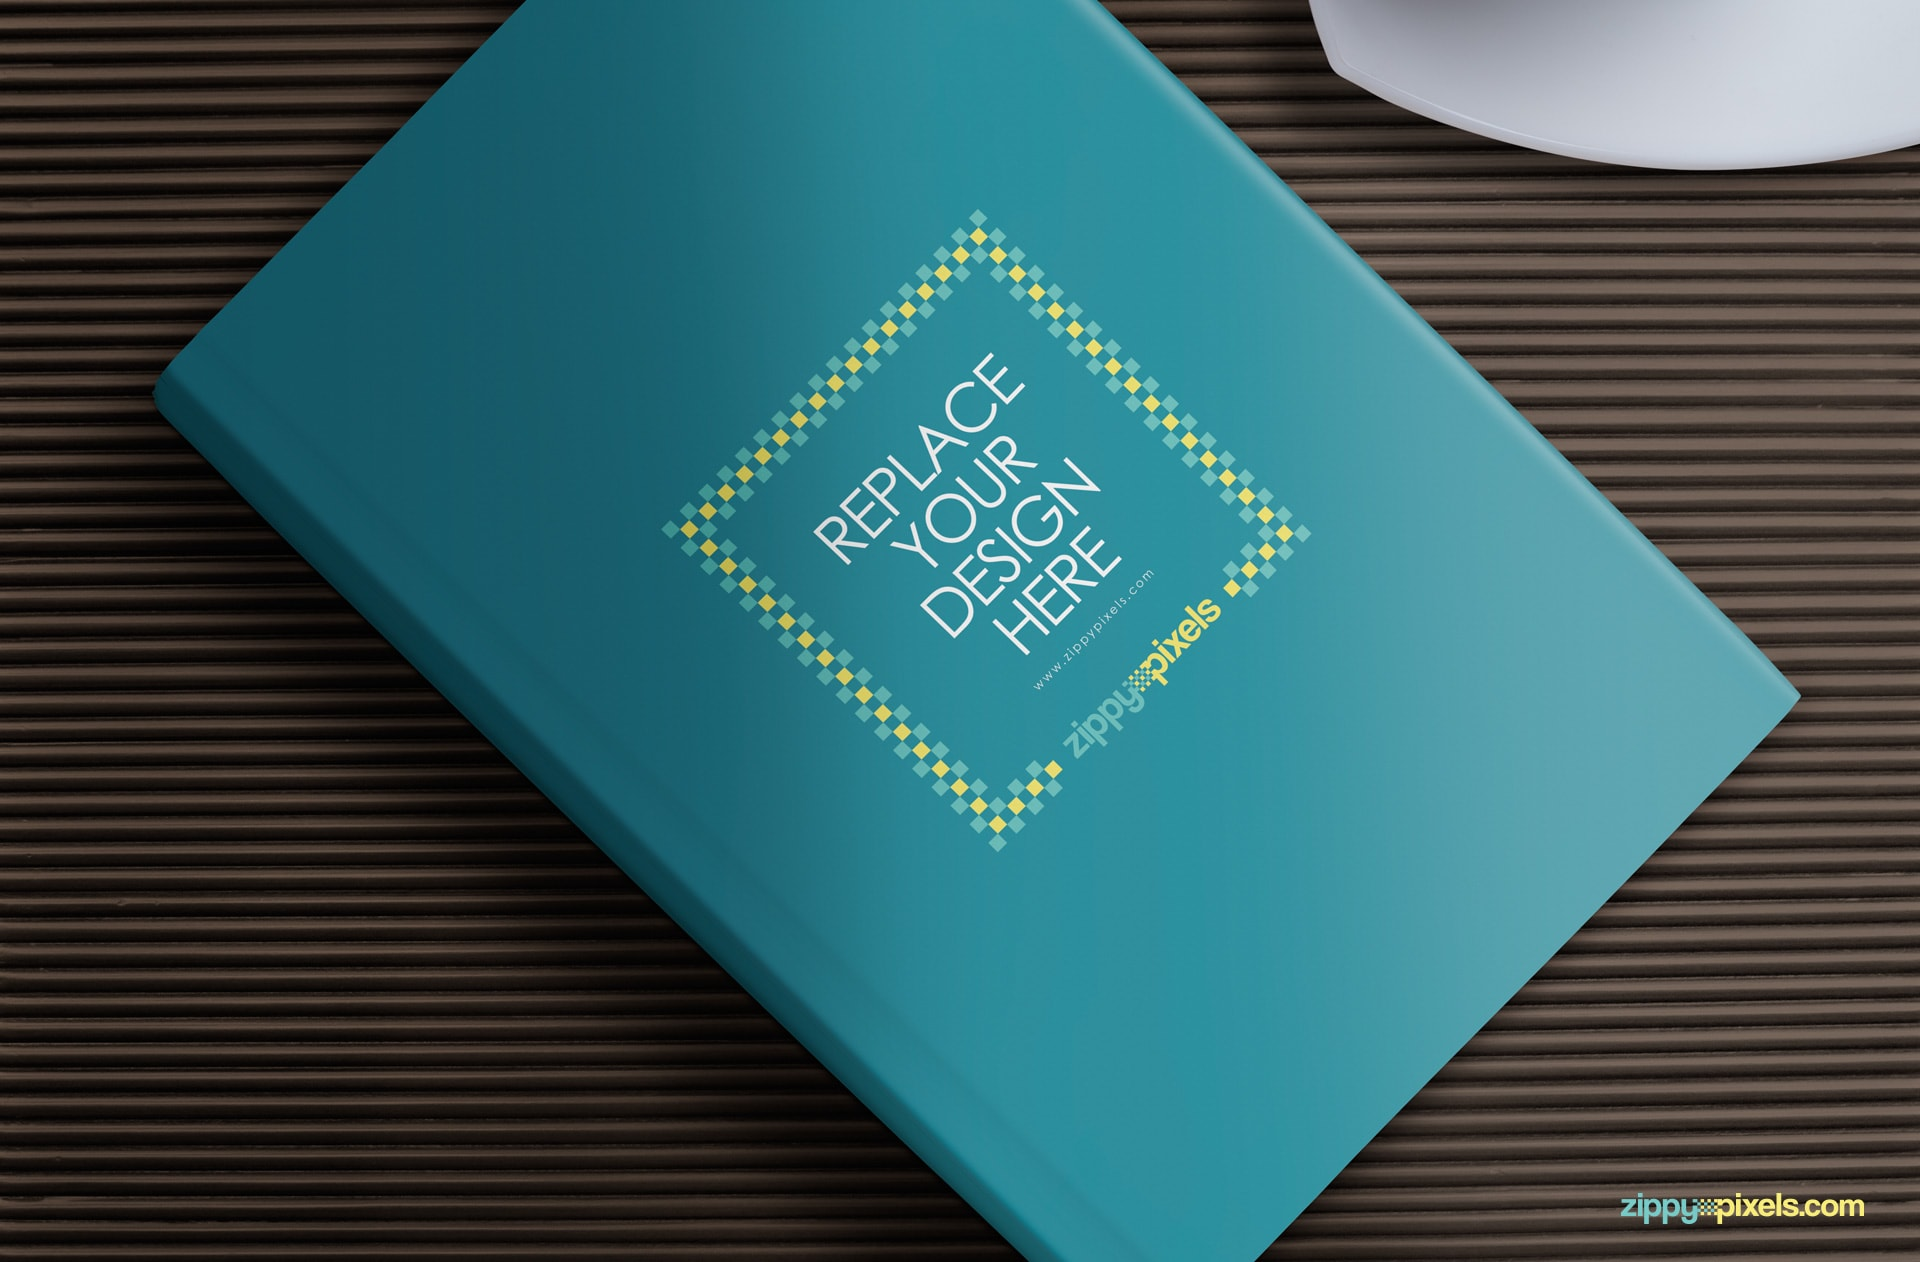 Book Cover Design Psd ~ Free book mockup for hardcover designs zippypixels